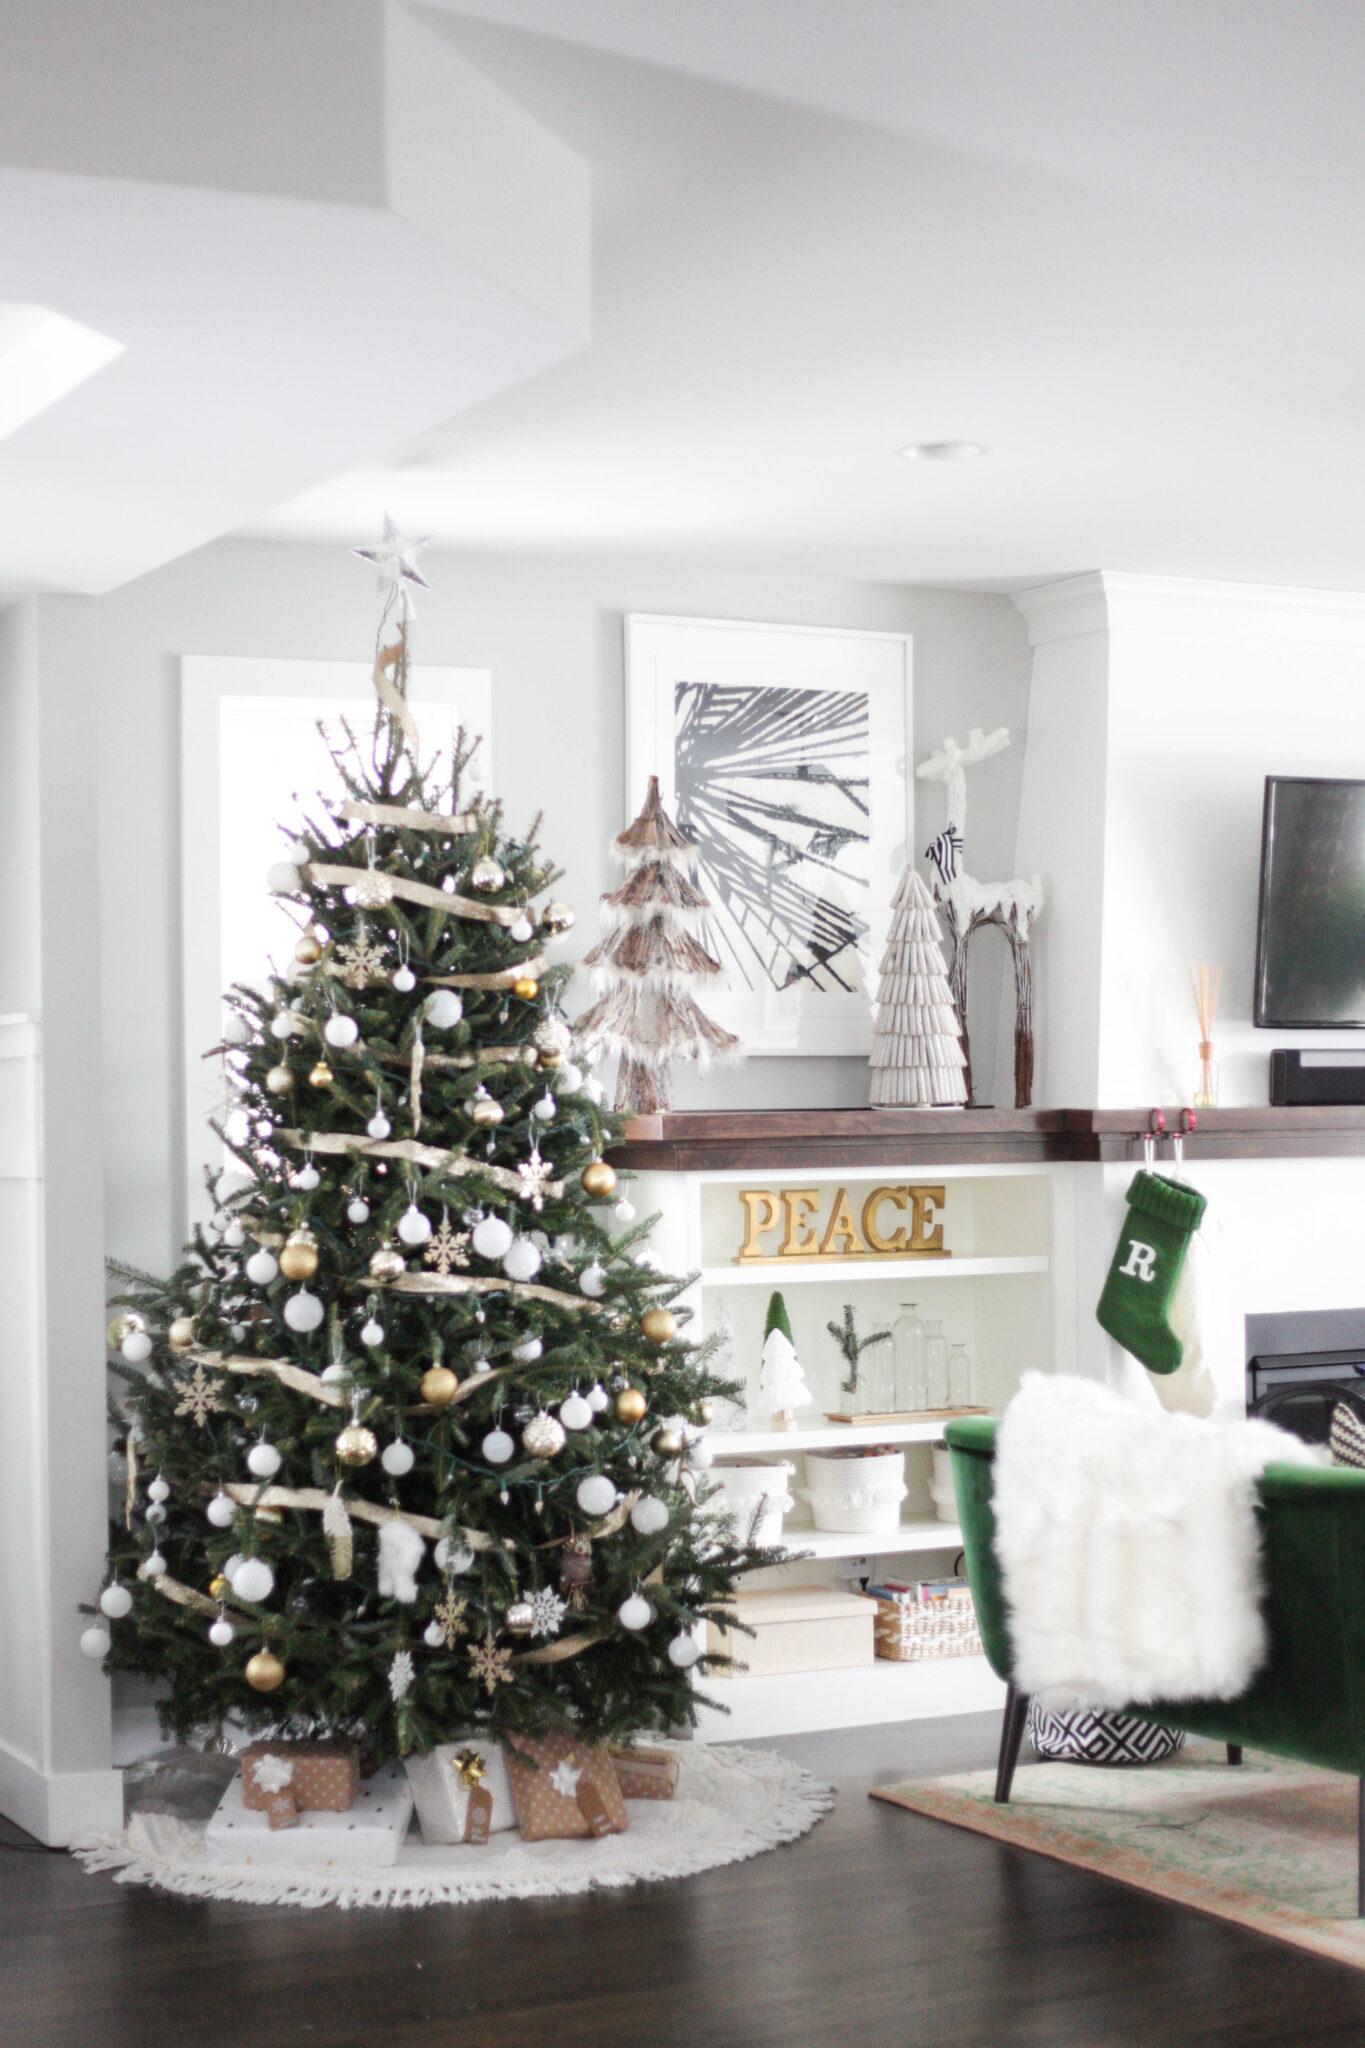 West Elm Christmas.House Tour Christmas Decor 2018 Paisley Sparrow